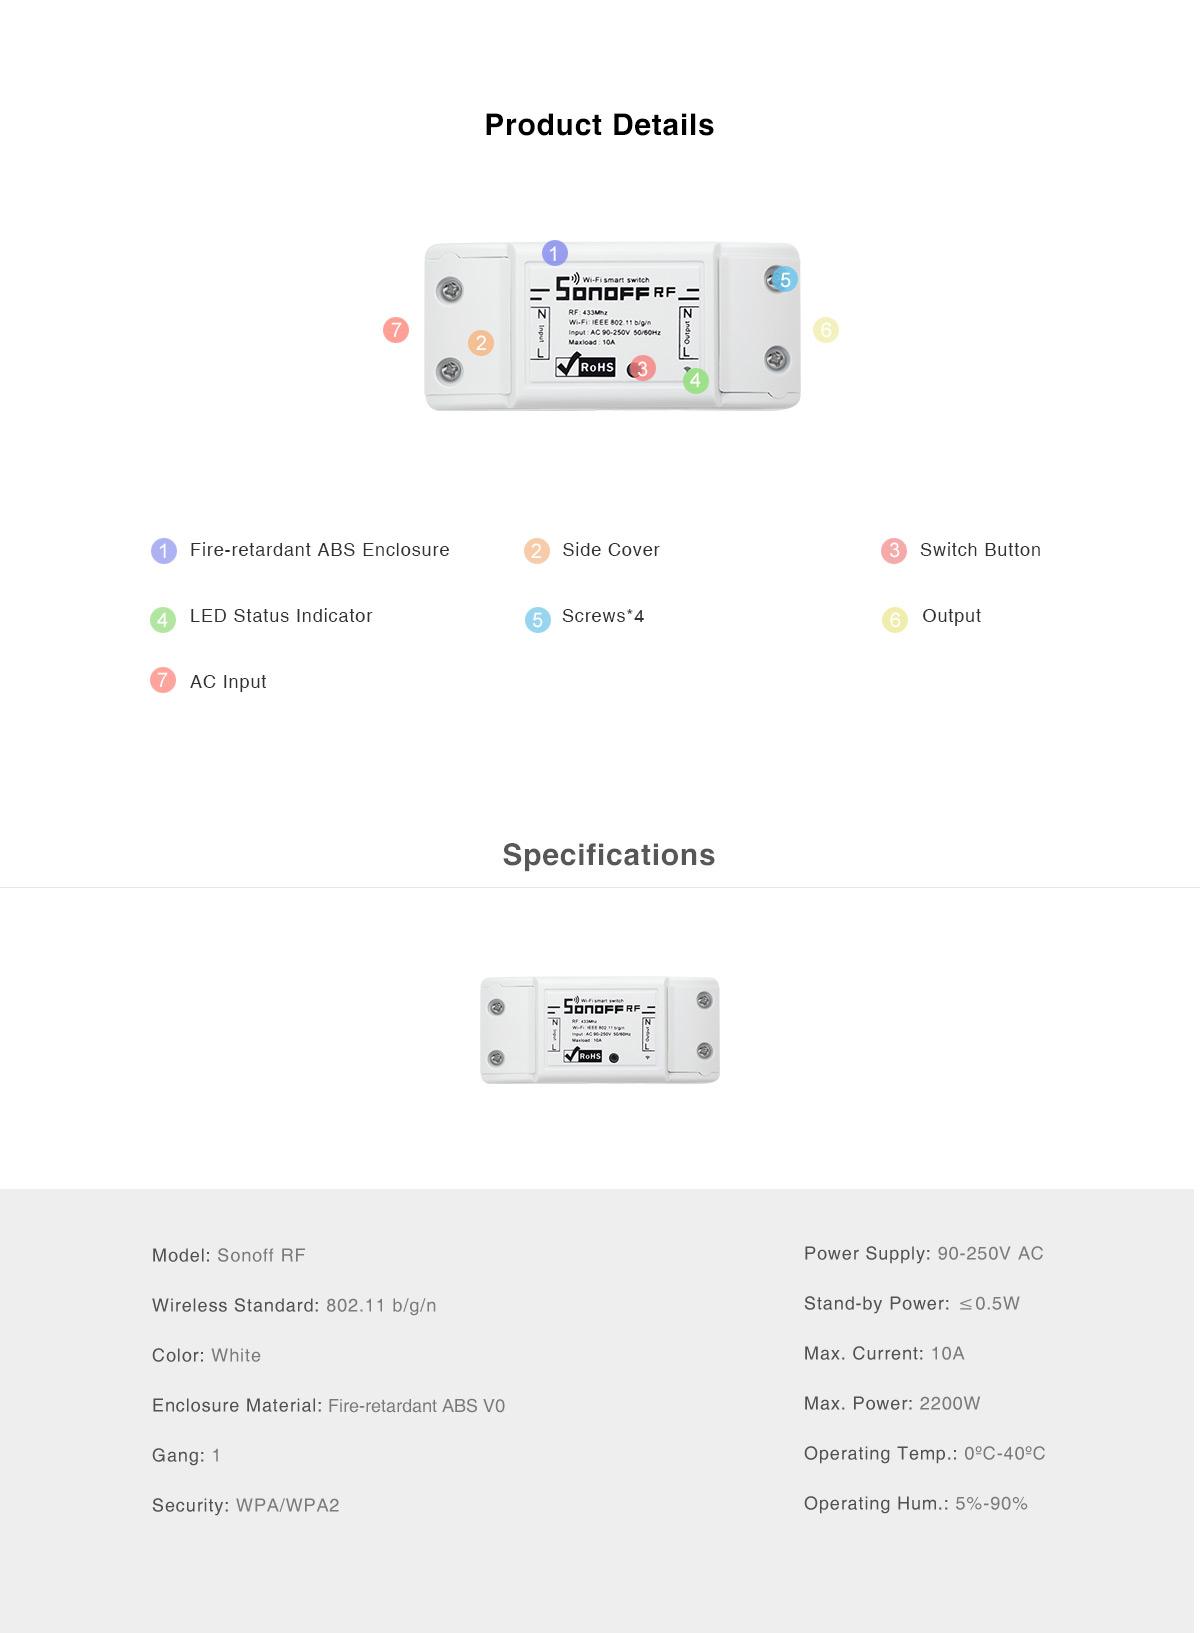 Android Box Dot Ir Sonoff RF 06 1